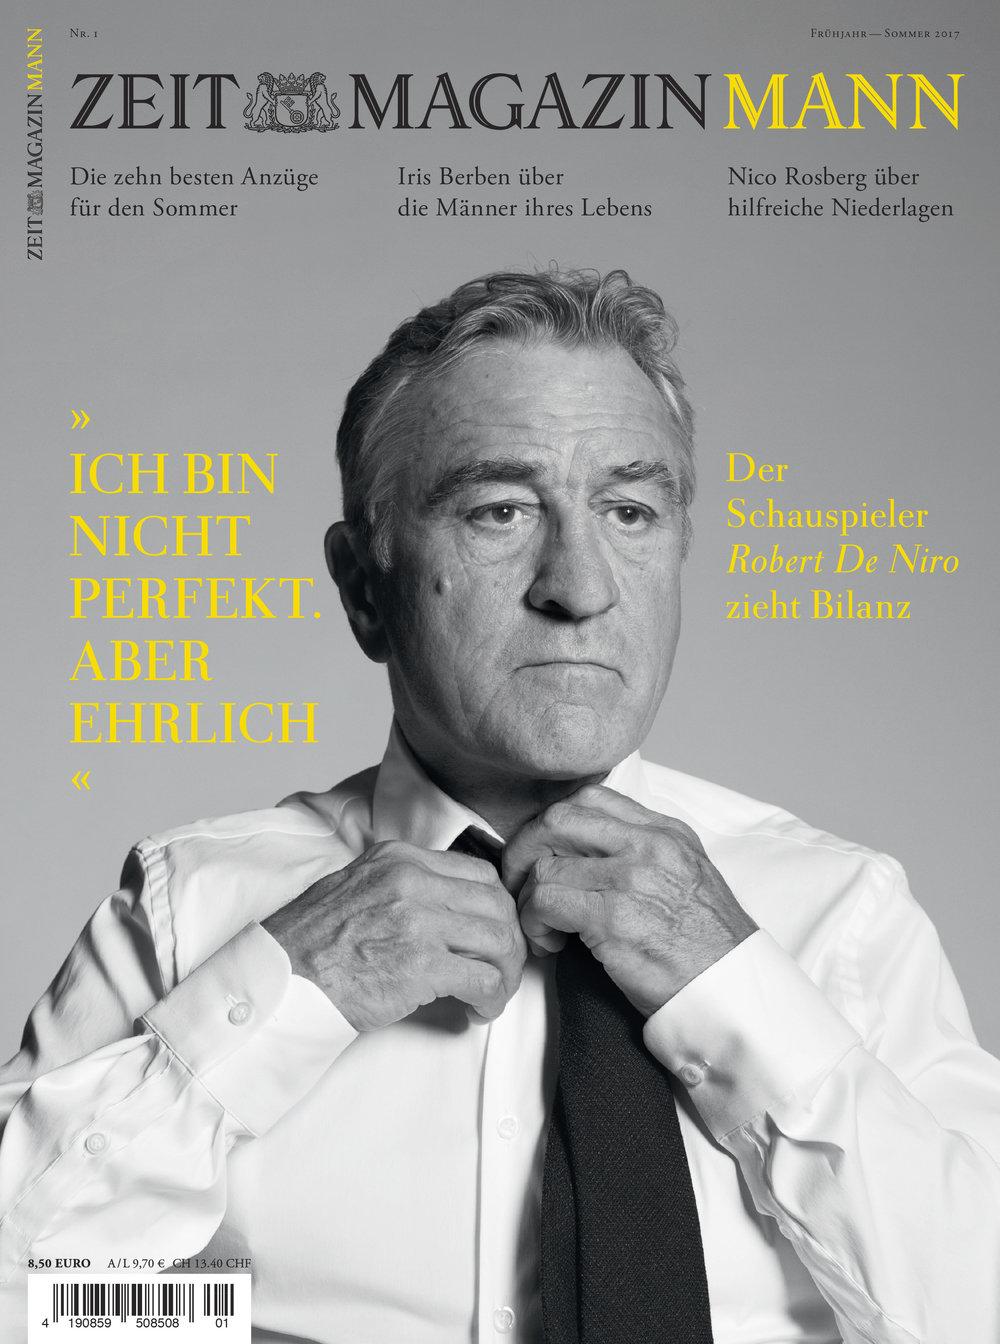 Robert DeNiro, ZEIT Magazin MANN cover, March 2017